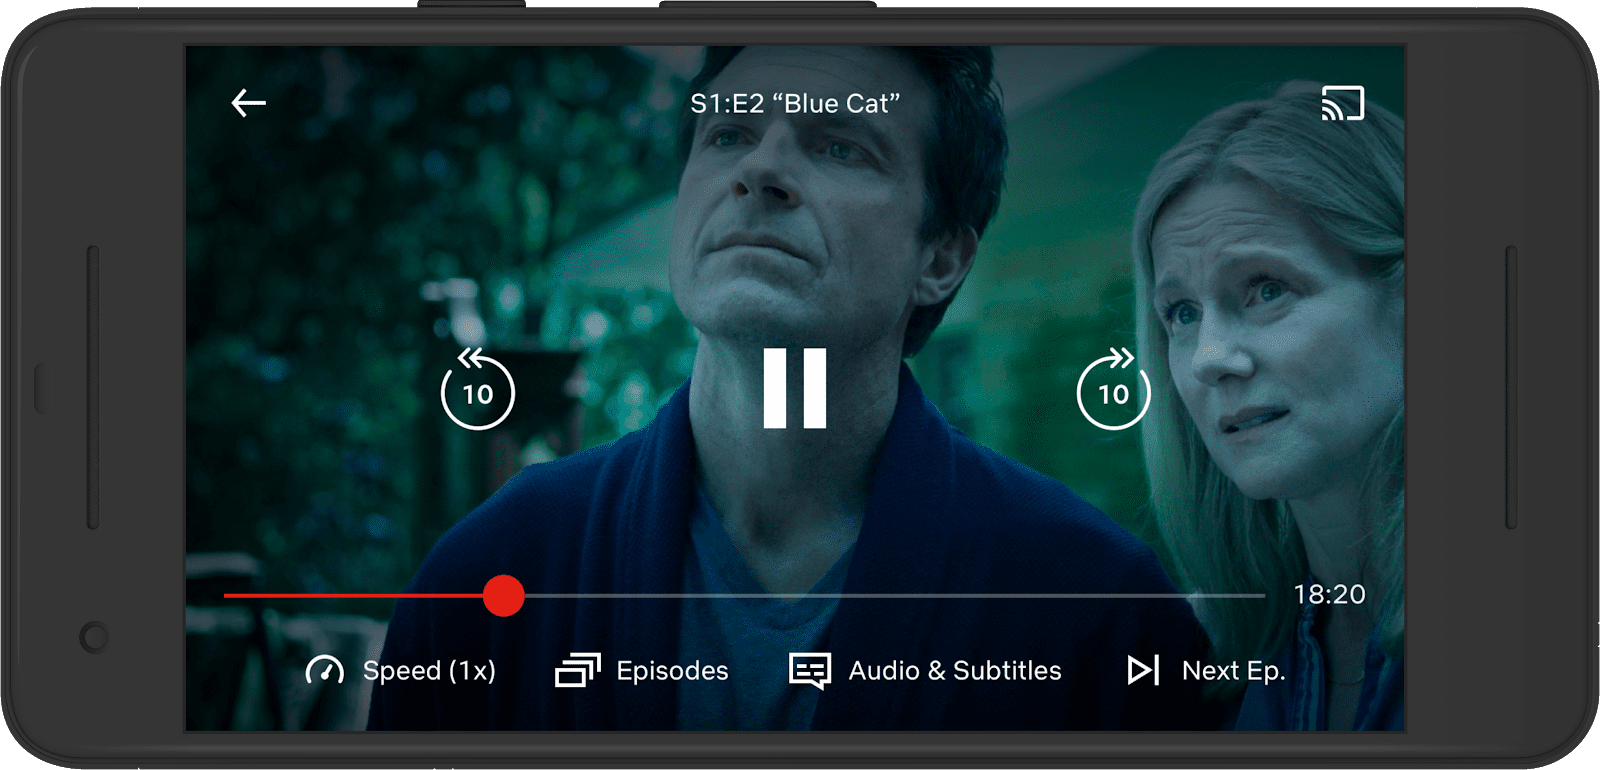 Netflix playback controls